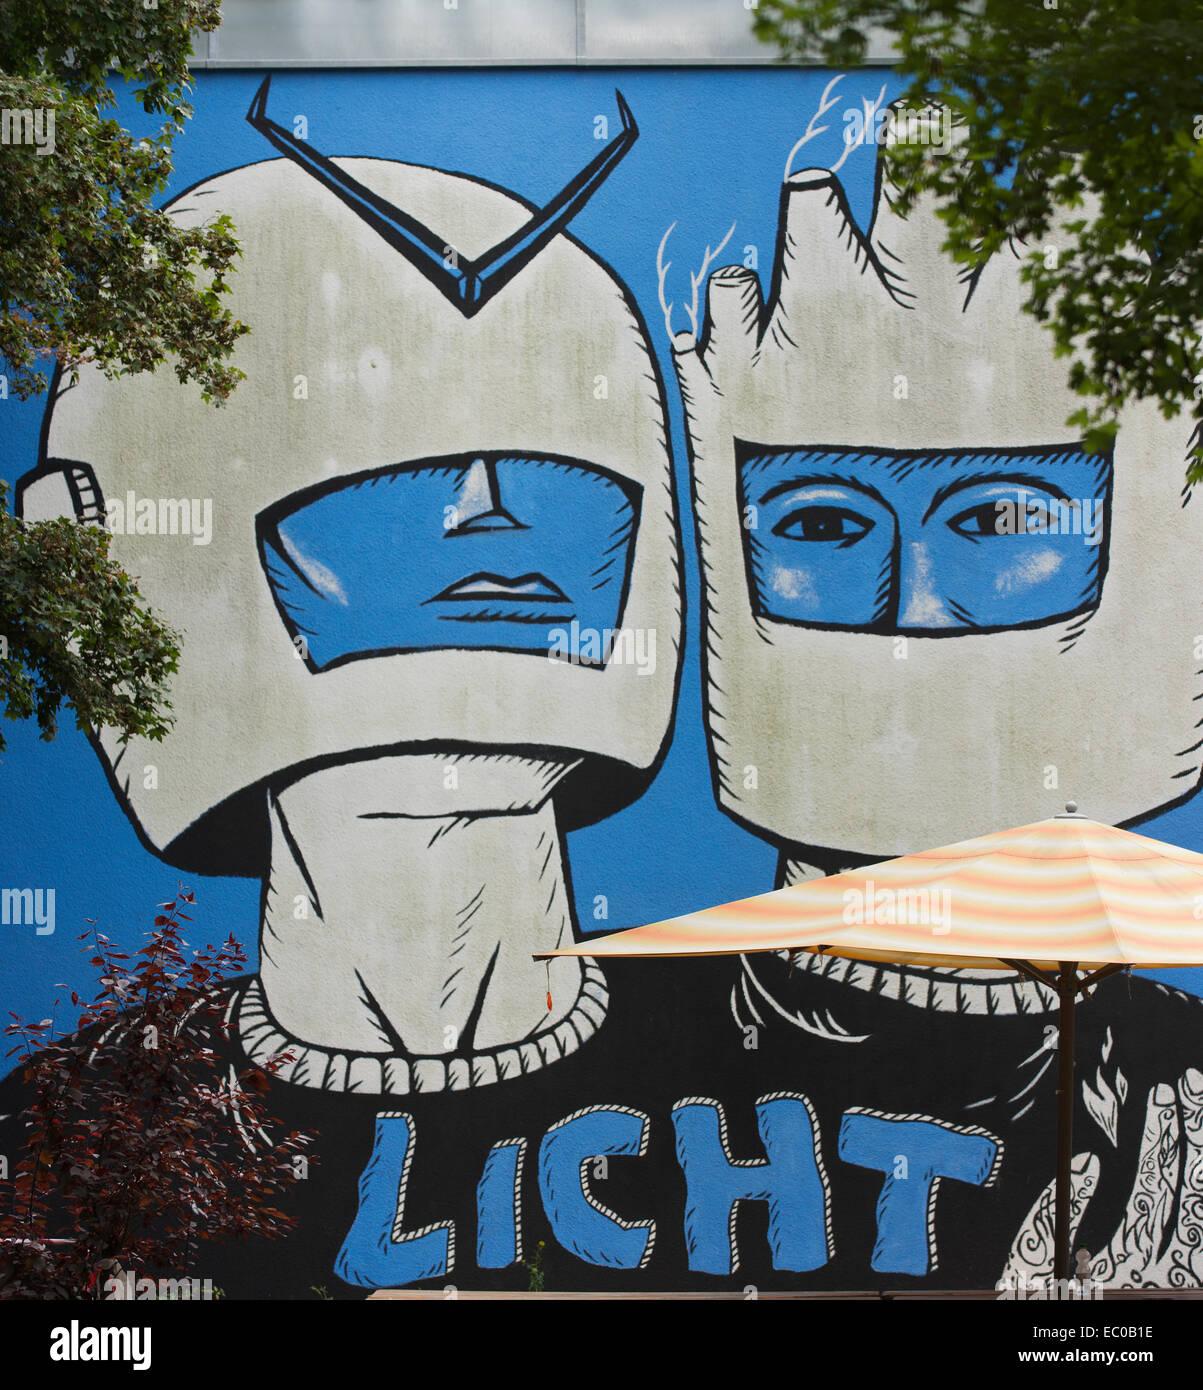 Wandbild mit dem Titel Licht (Licht) in Berlin Kreuzberg. Stockbild